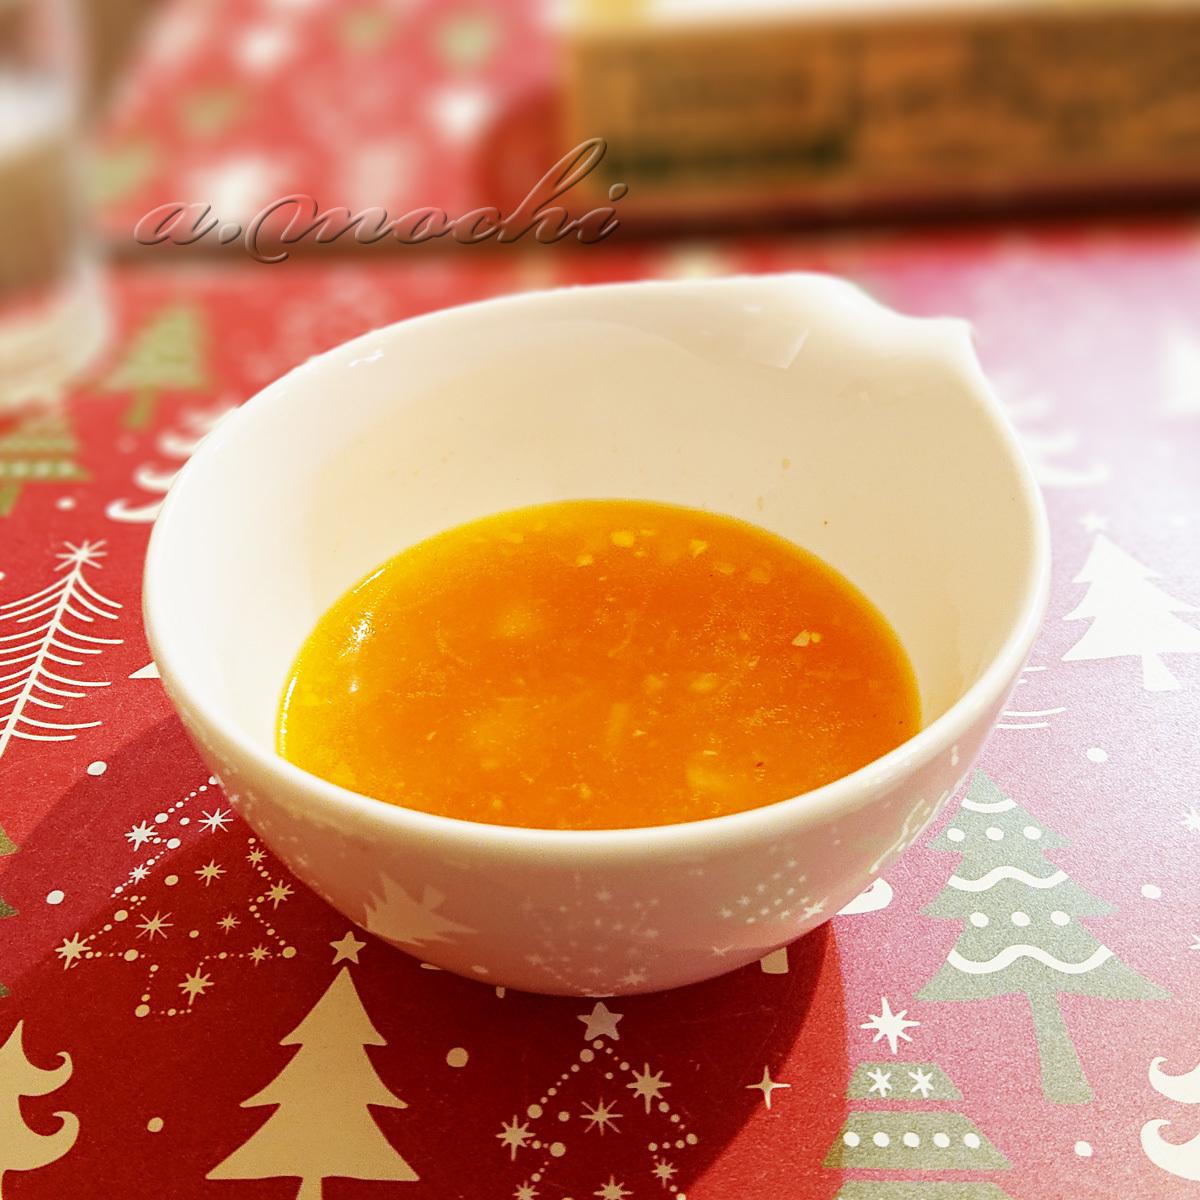 4_pastapasta2_soup.jpg